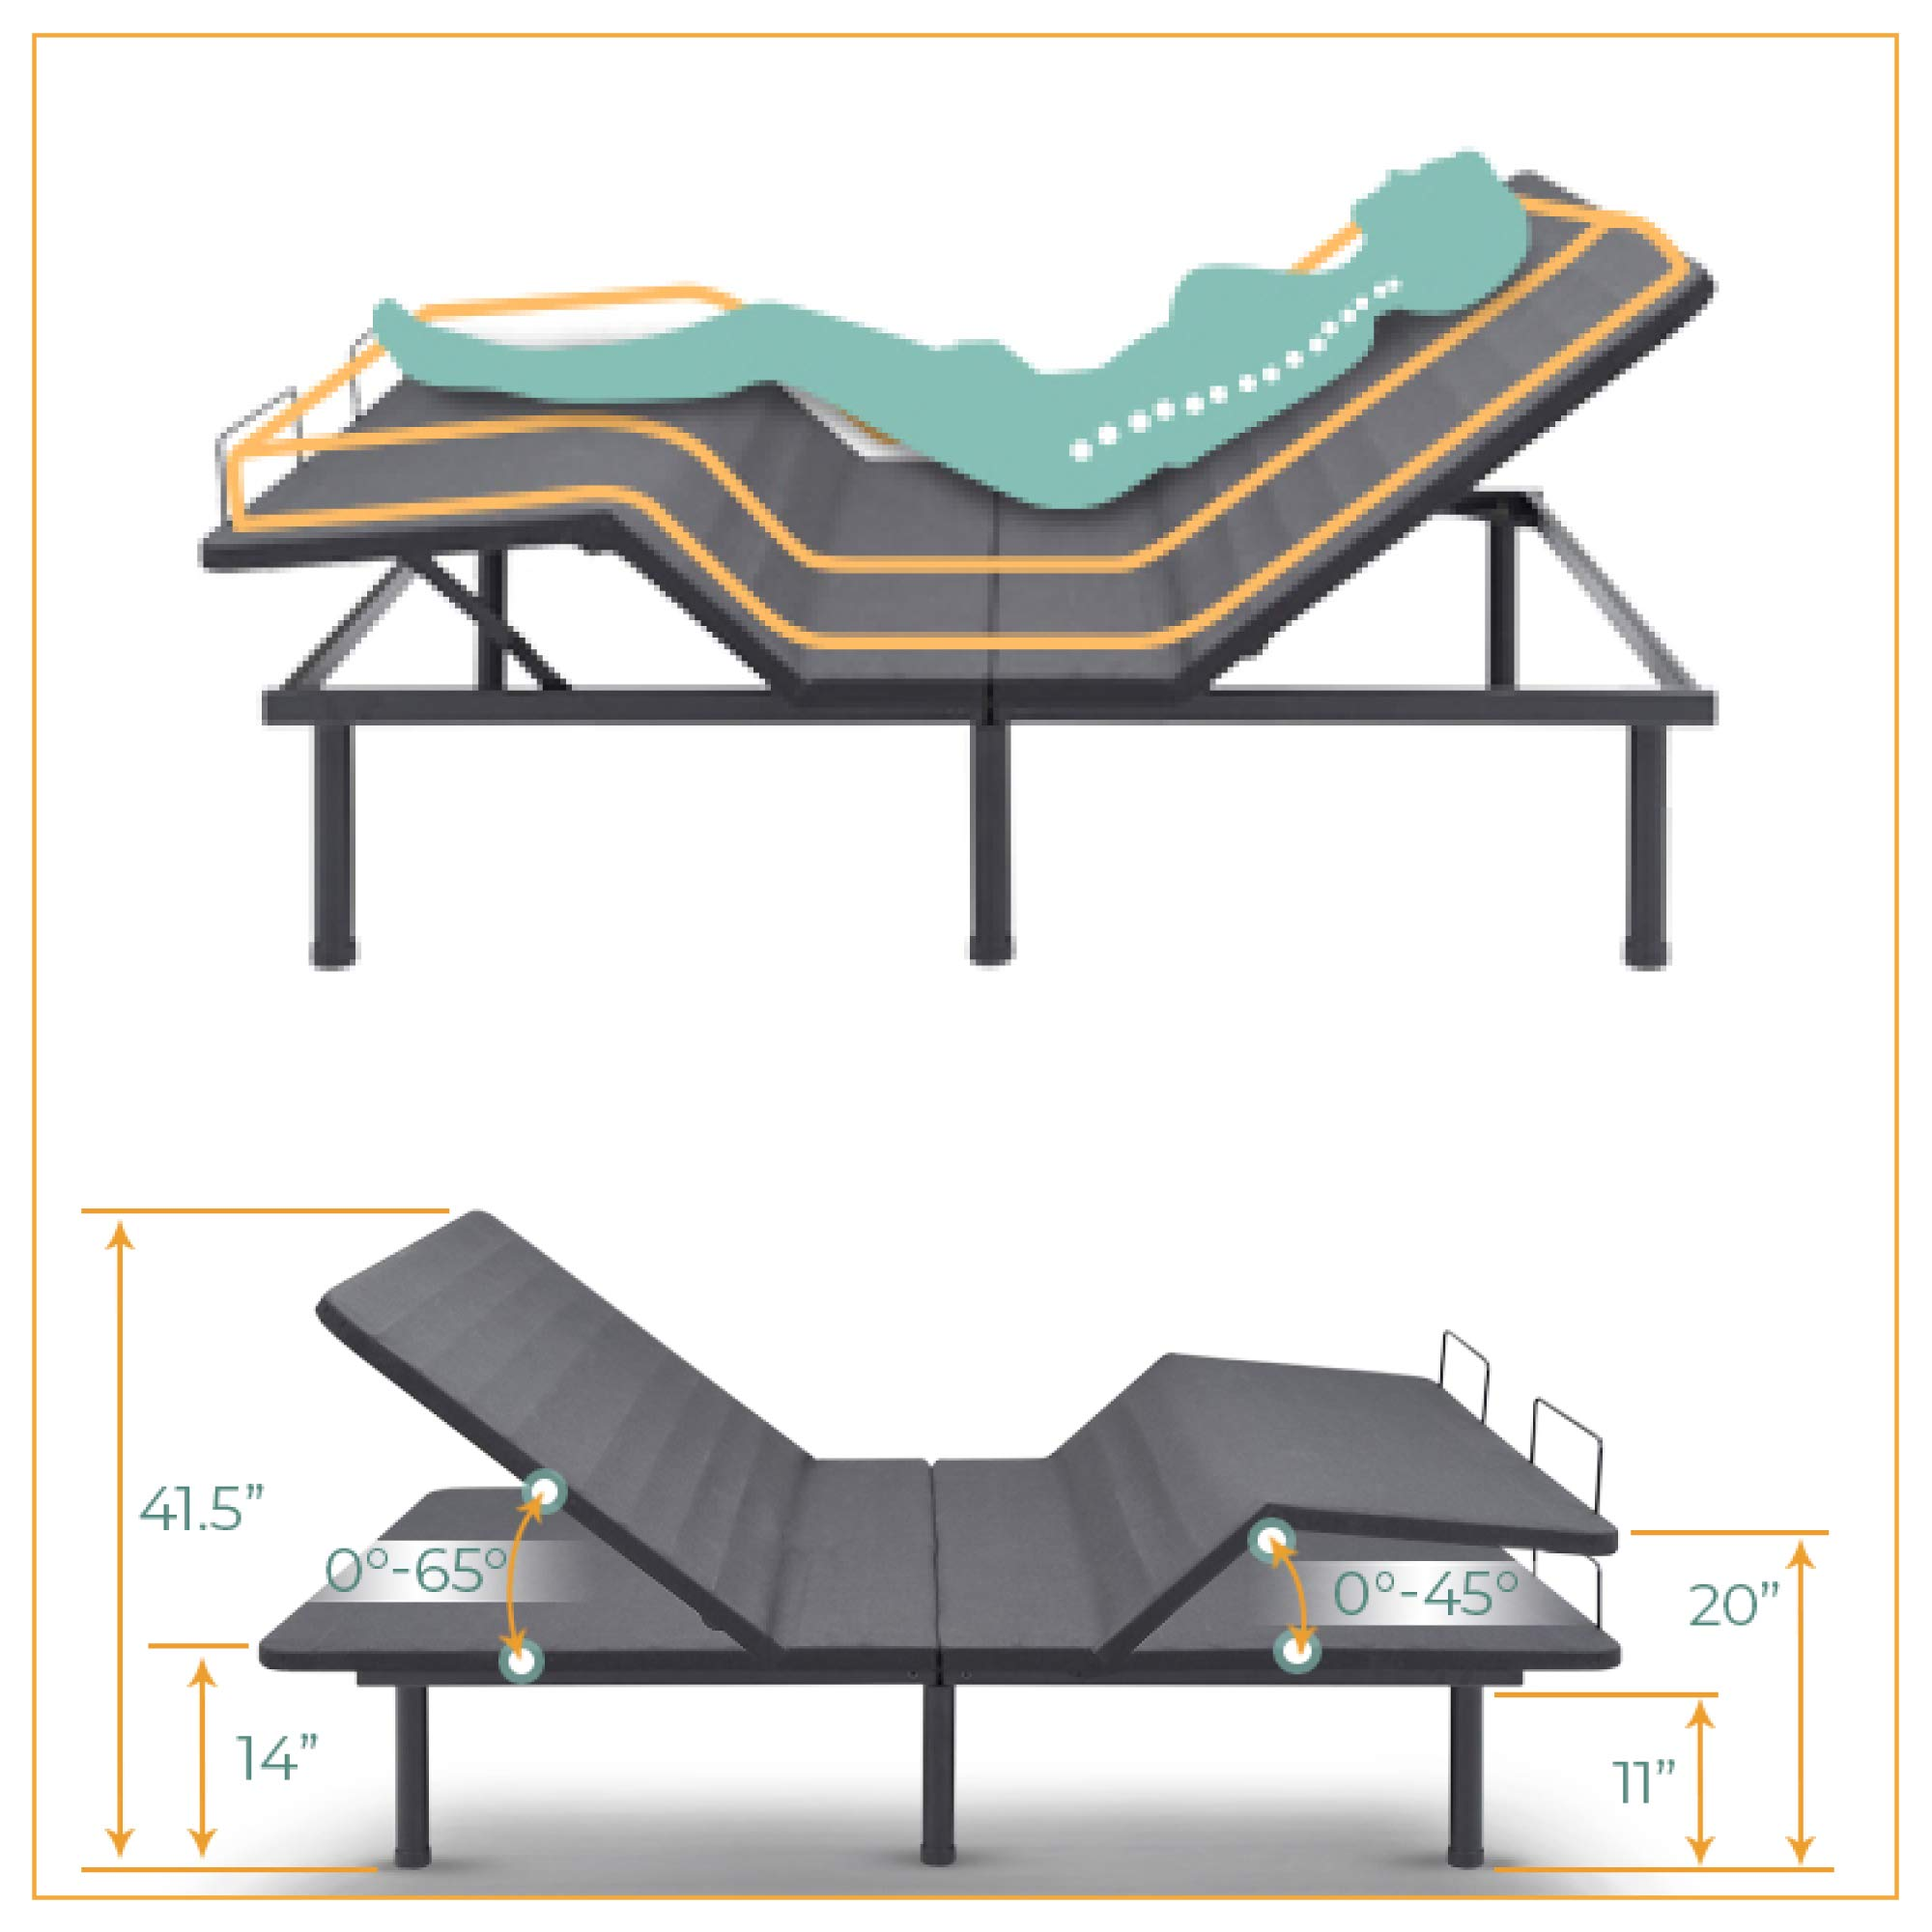 Classic Brands Adjustable Comfort Affordamatic 2.0 Adjustable Bed Base, Full by Classic Brands